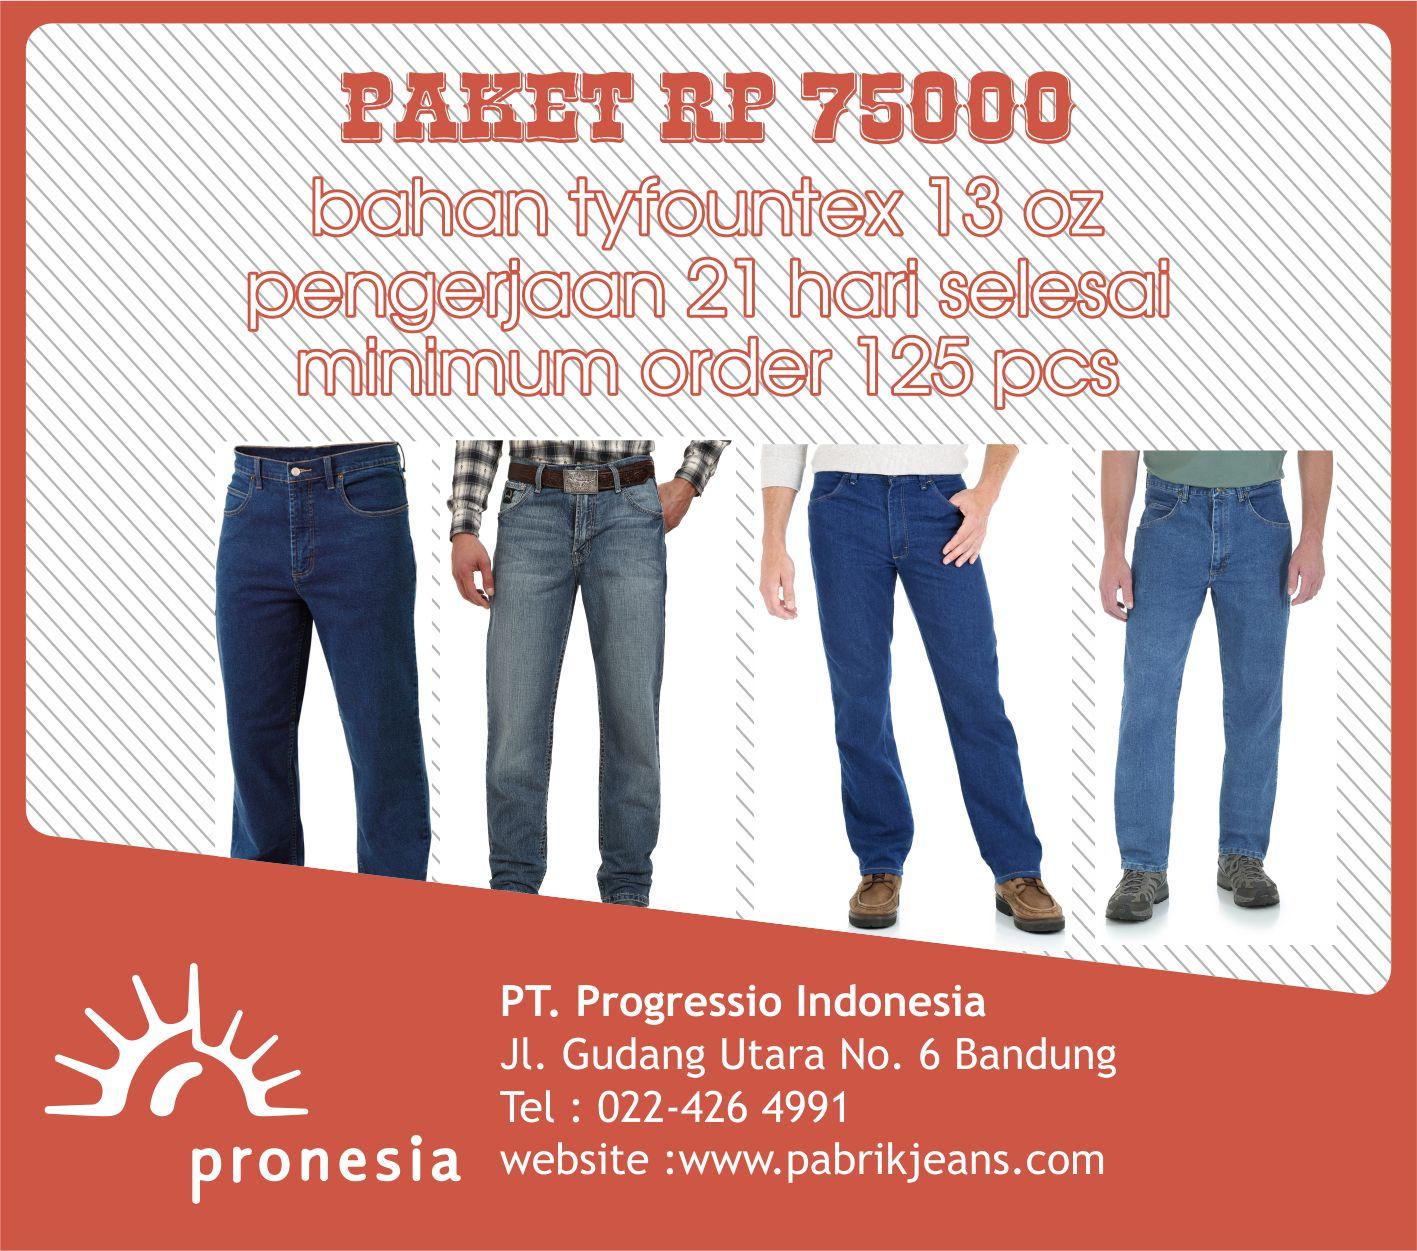 konveksi jeans